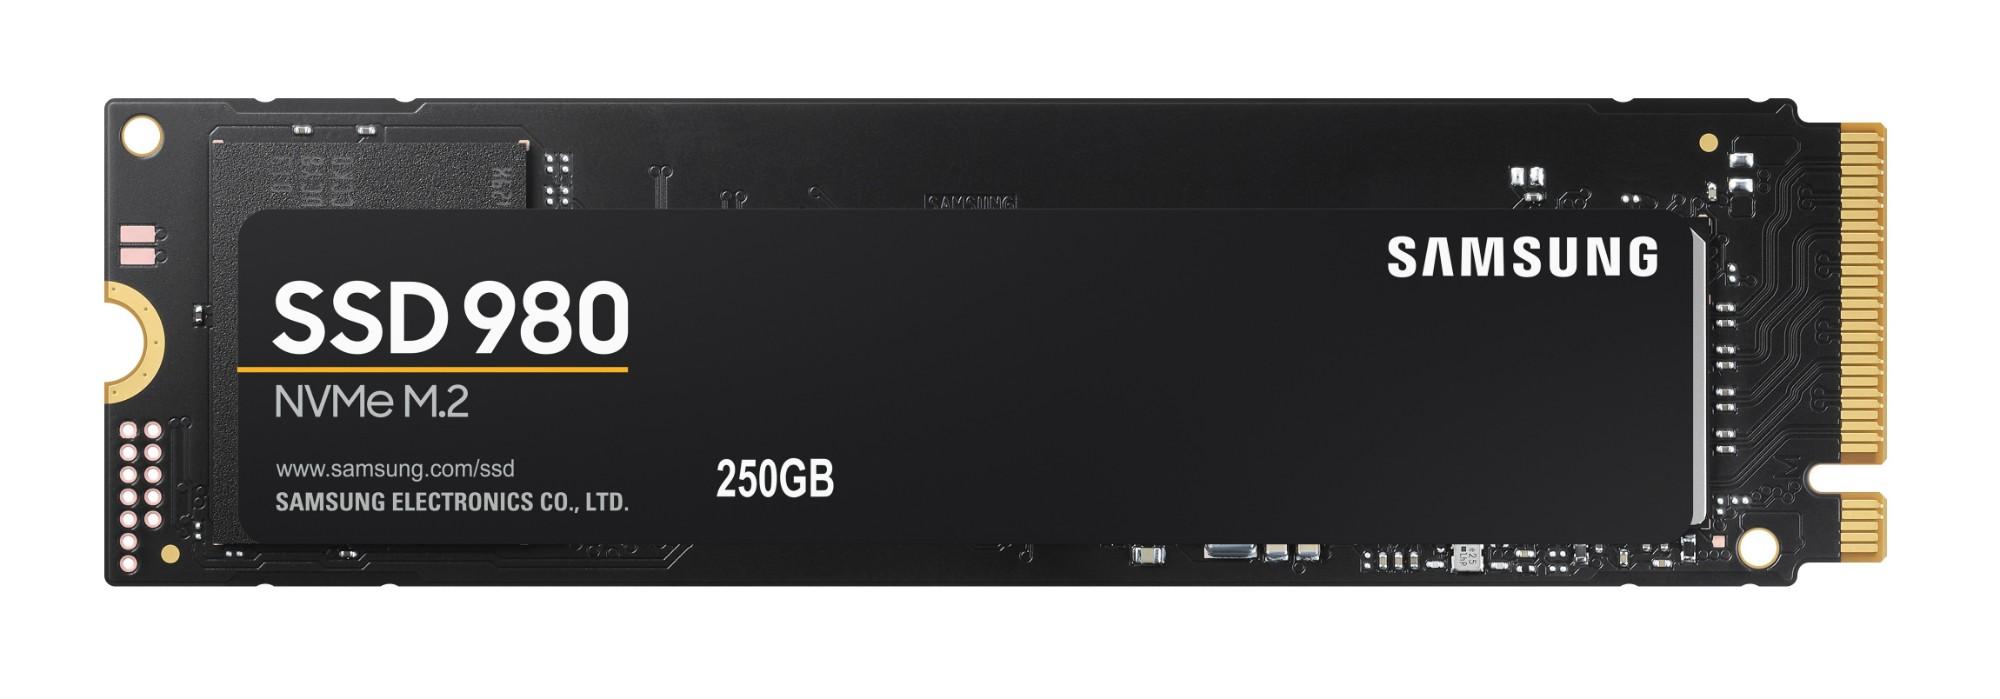 Samsung 980 M.2 250 GB PCI Express 3.0 V-NAND NVMe